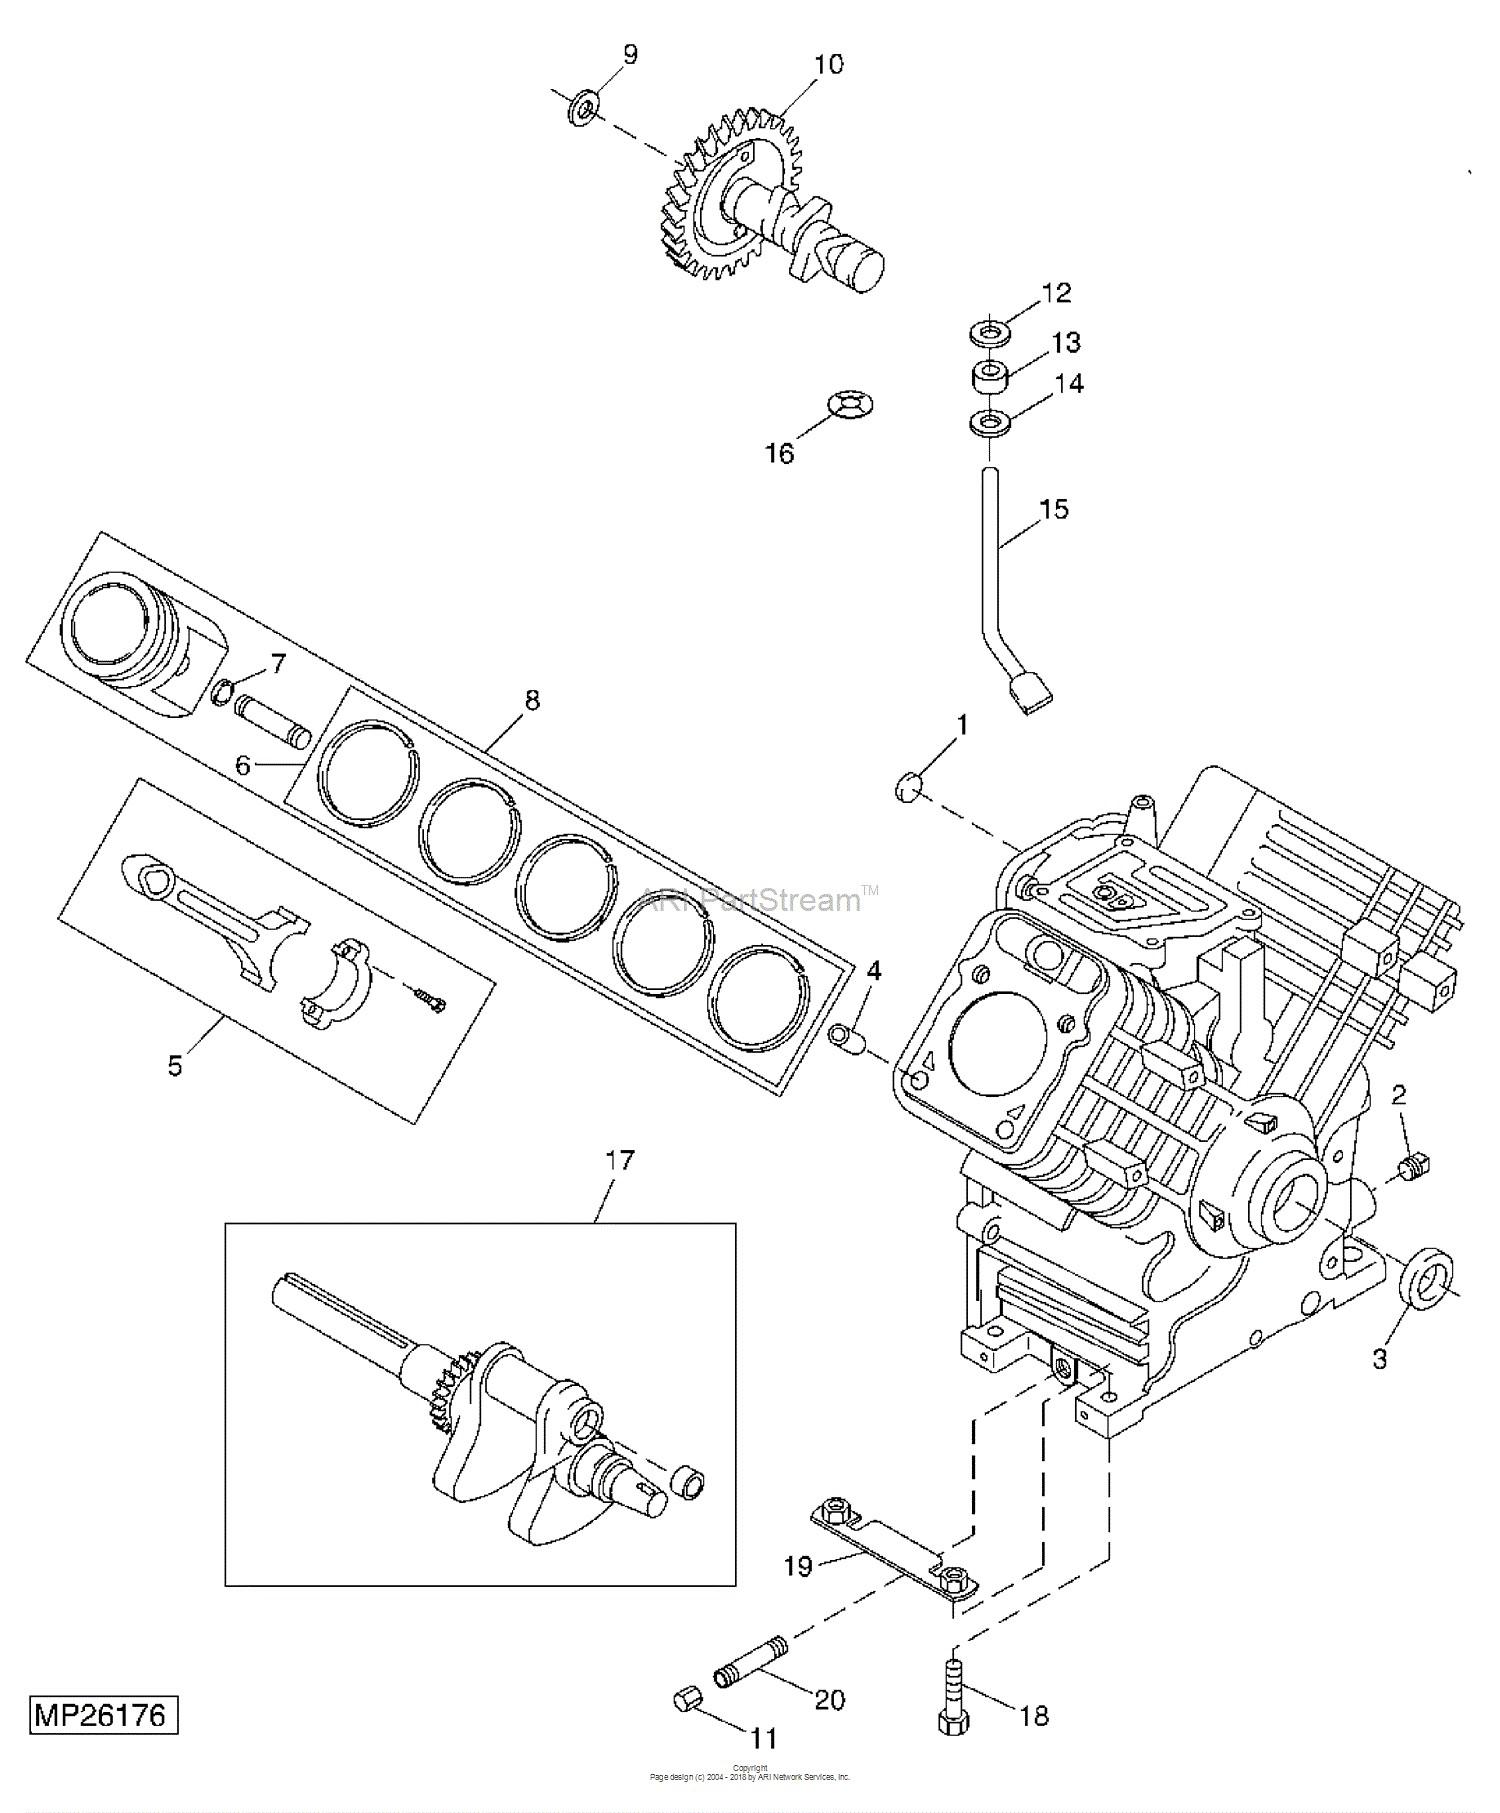 Piston Parts Diagram John Deere Parts Diagrams John Deere F687 Gas Z Trak Front Mower Of Piston Parts Diagram